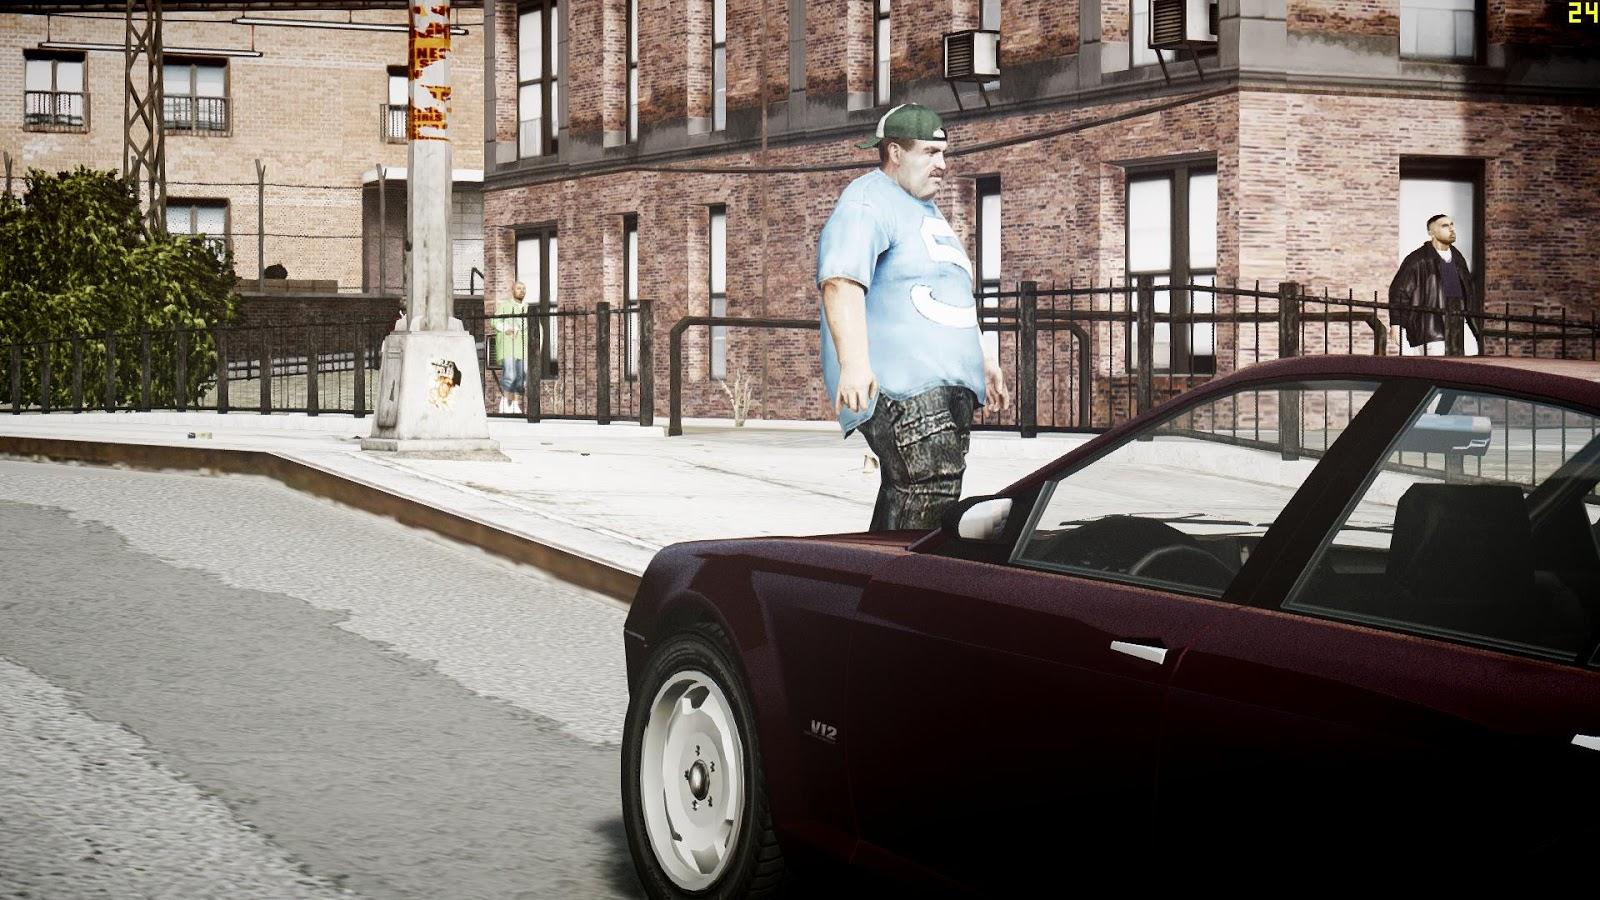 GTA 5,GTAV,GTA IV Mods and Skins: GTA IV MOD:Fat Niko